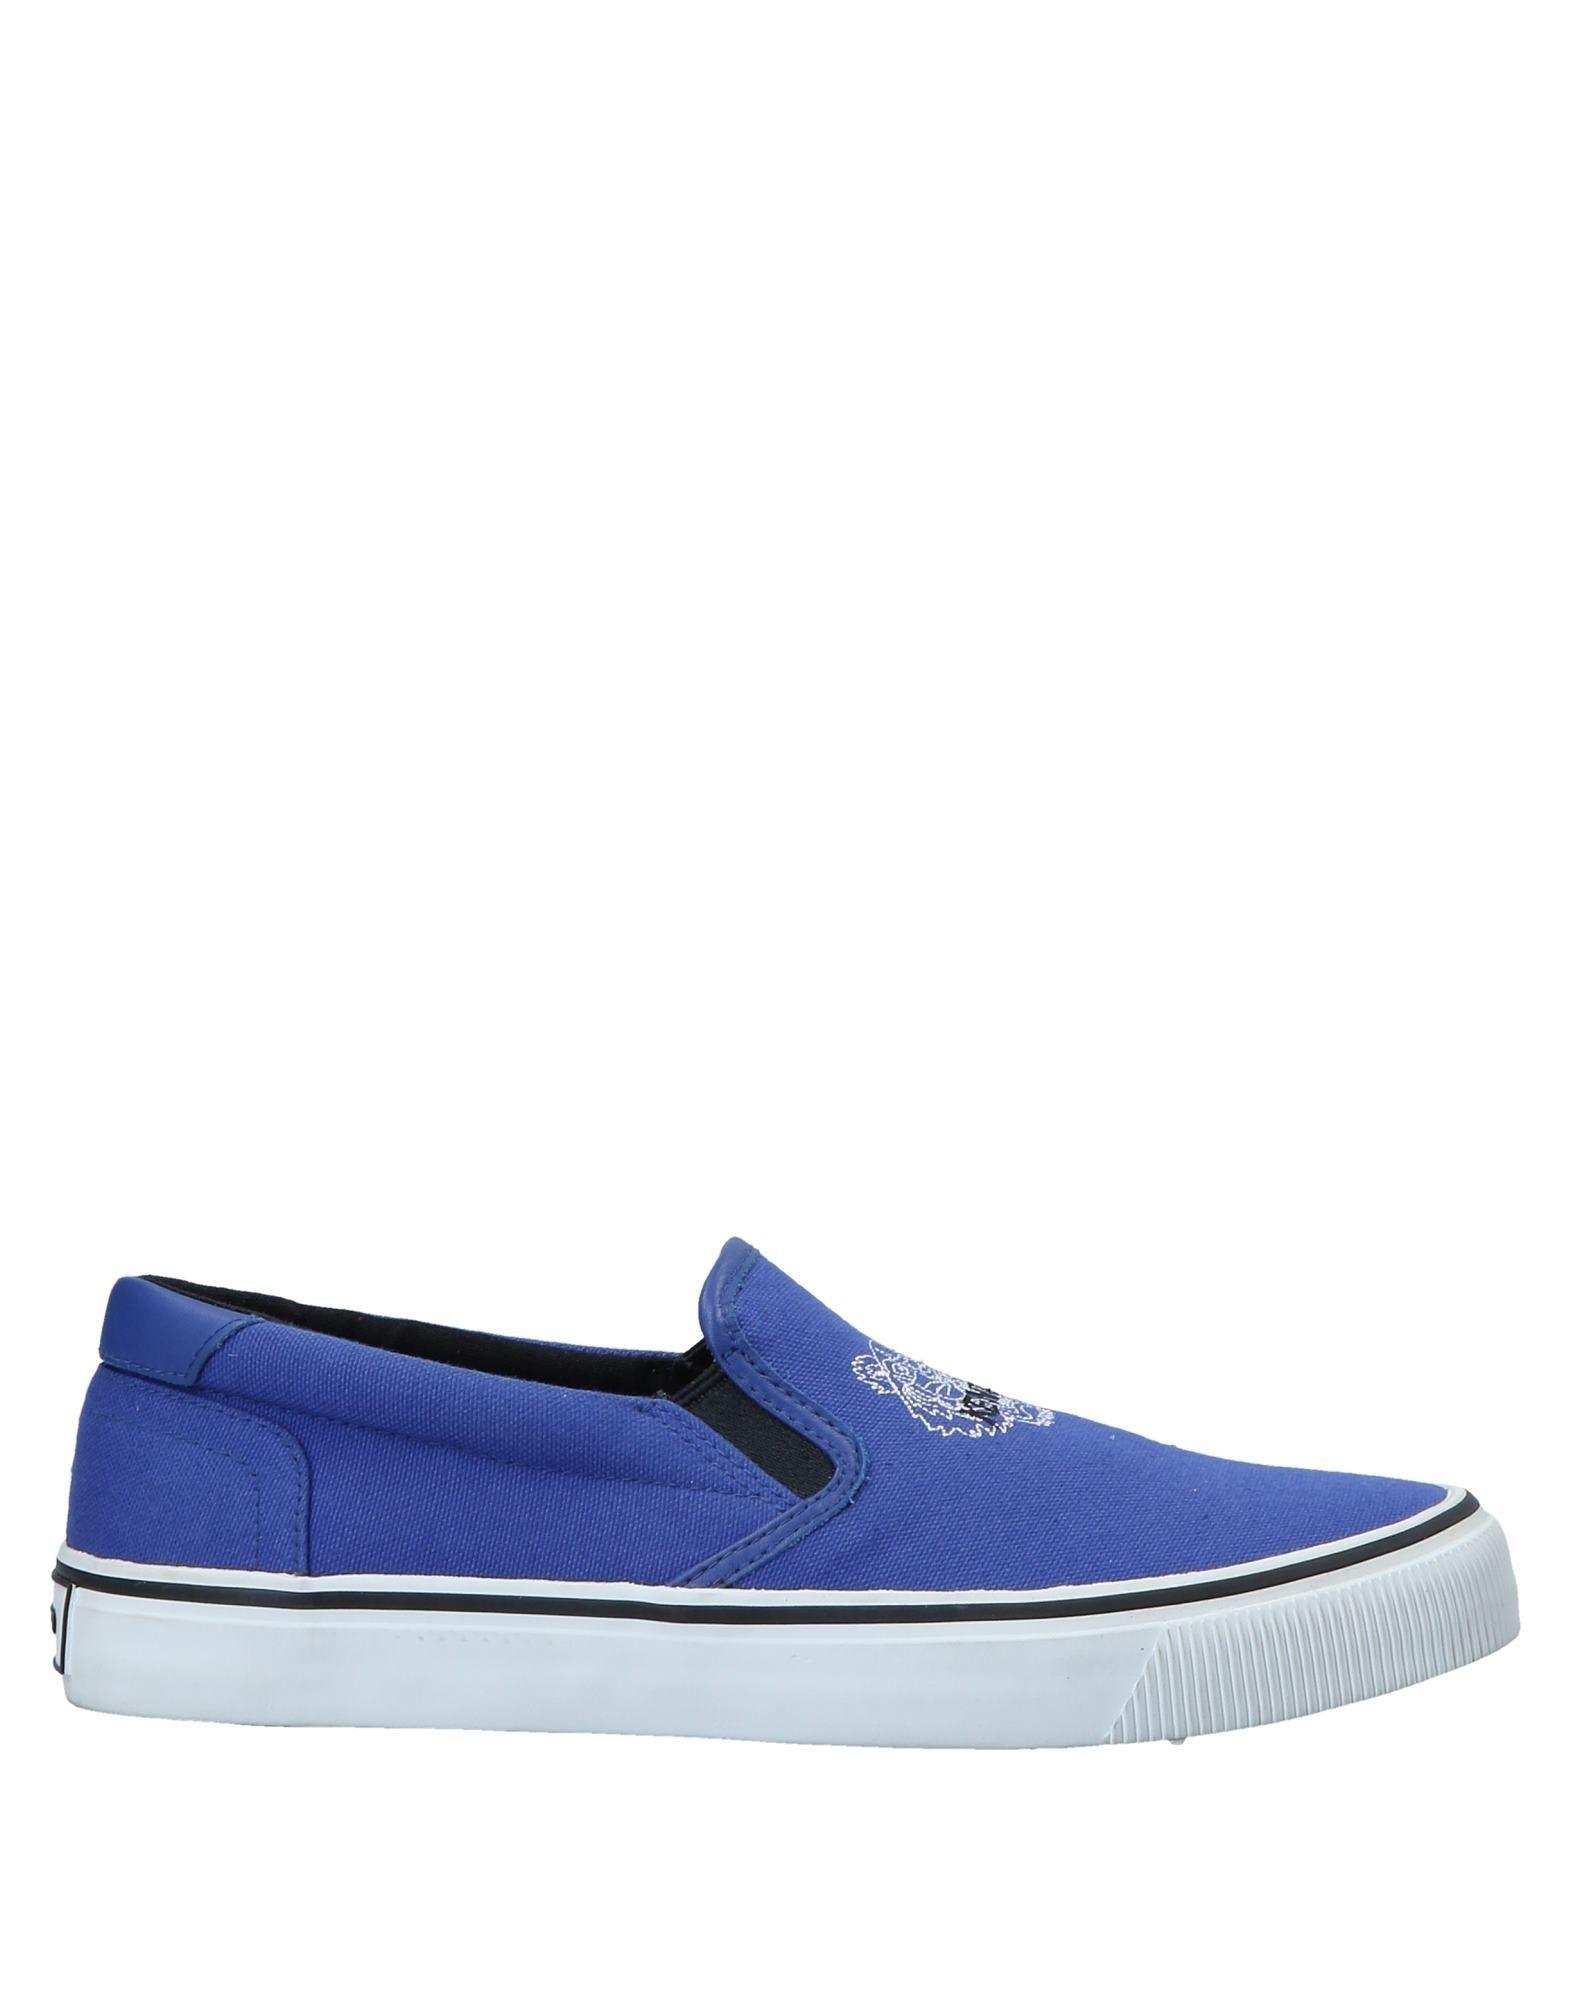 Kenzo Sneakers - Canada Men Kenzo Sneakers online on  Canada - - 11551546UA abdd3e